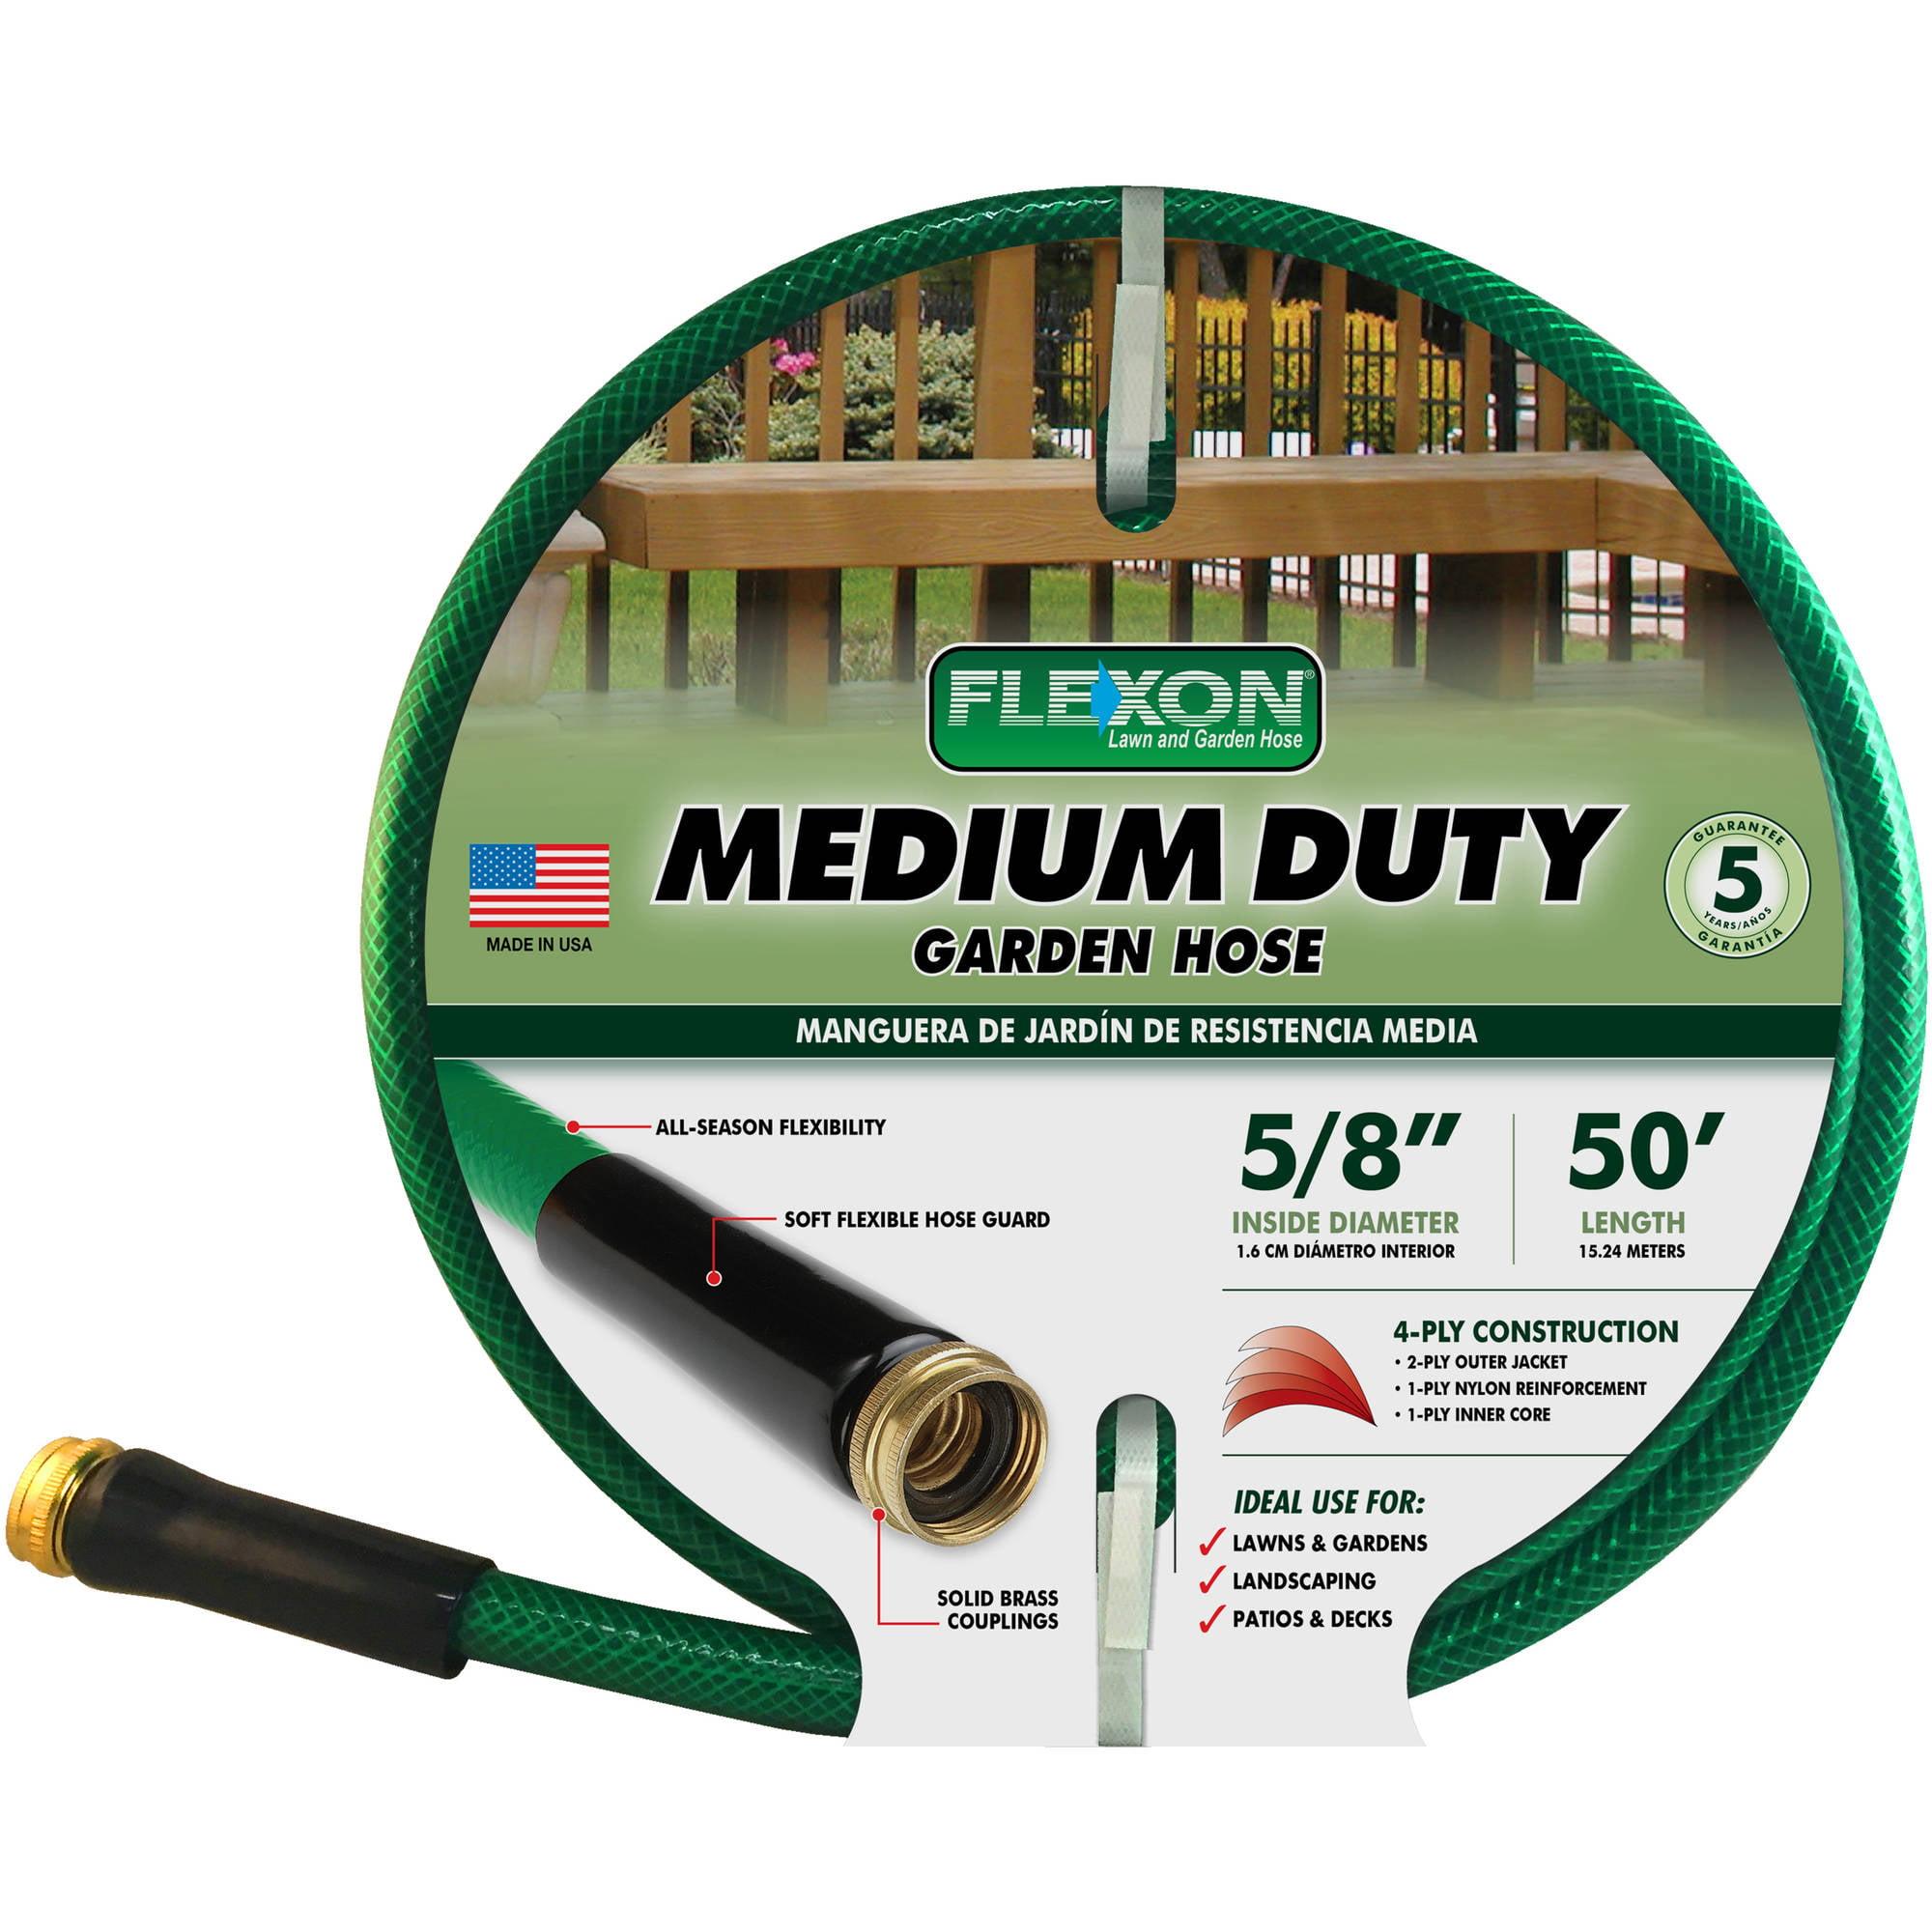 Flexon 50 Medium Duty Garden Hose, Green